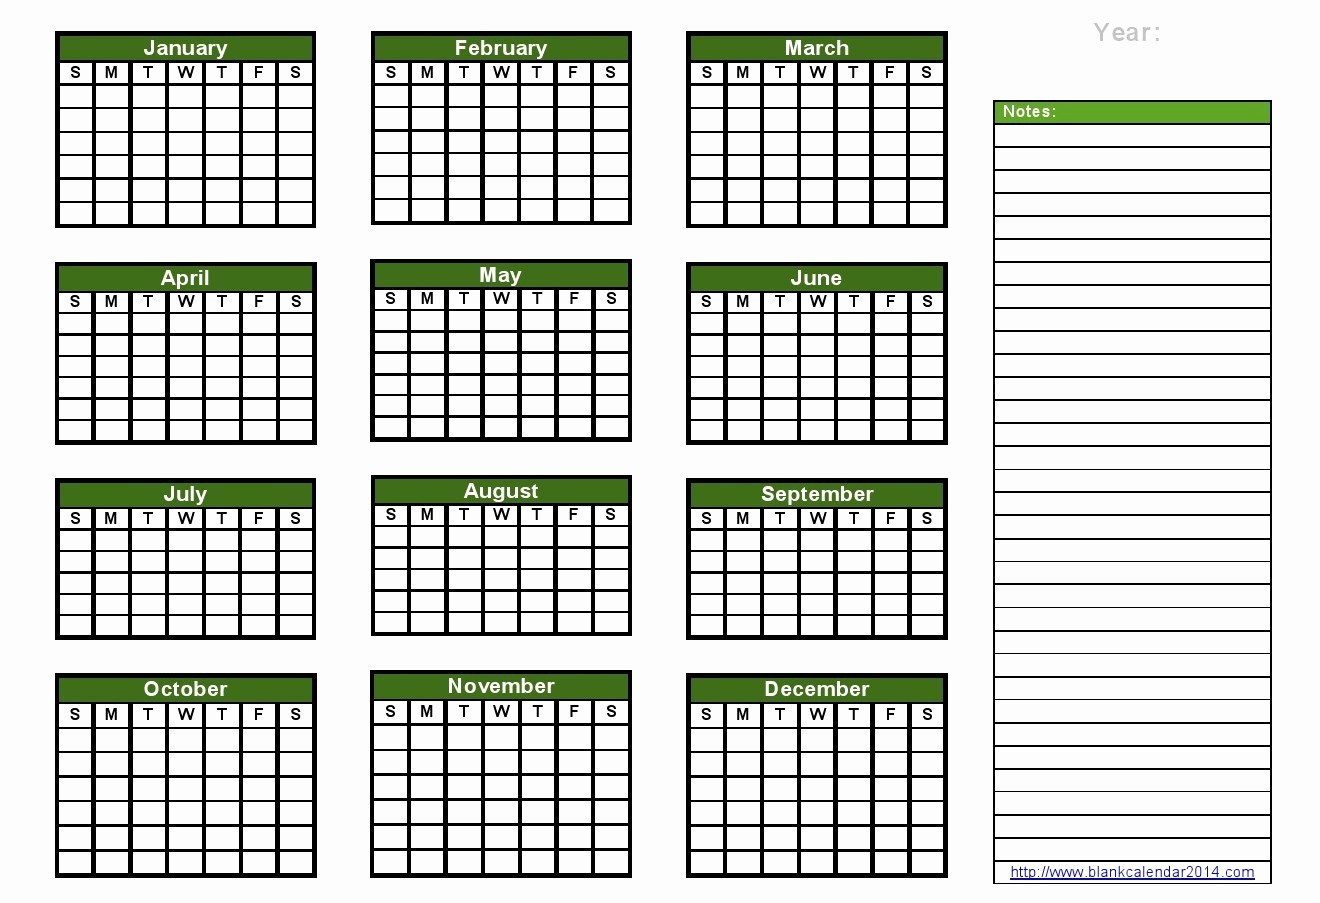 Free Editable Calendar Template 2015 Lovely Printable Editable Calendar 2015 – 2017 Printable Calendar